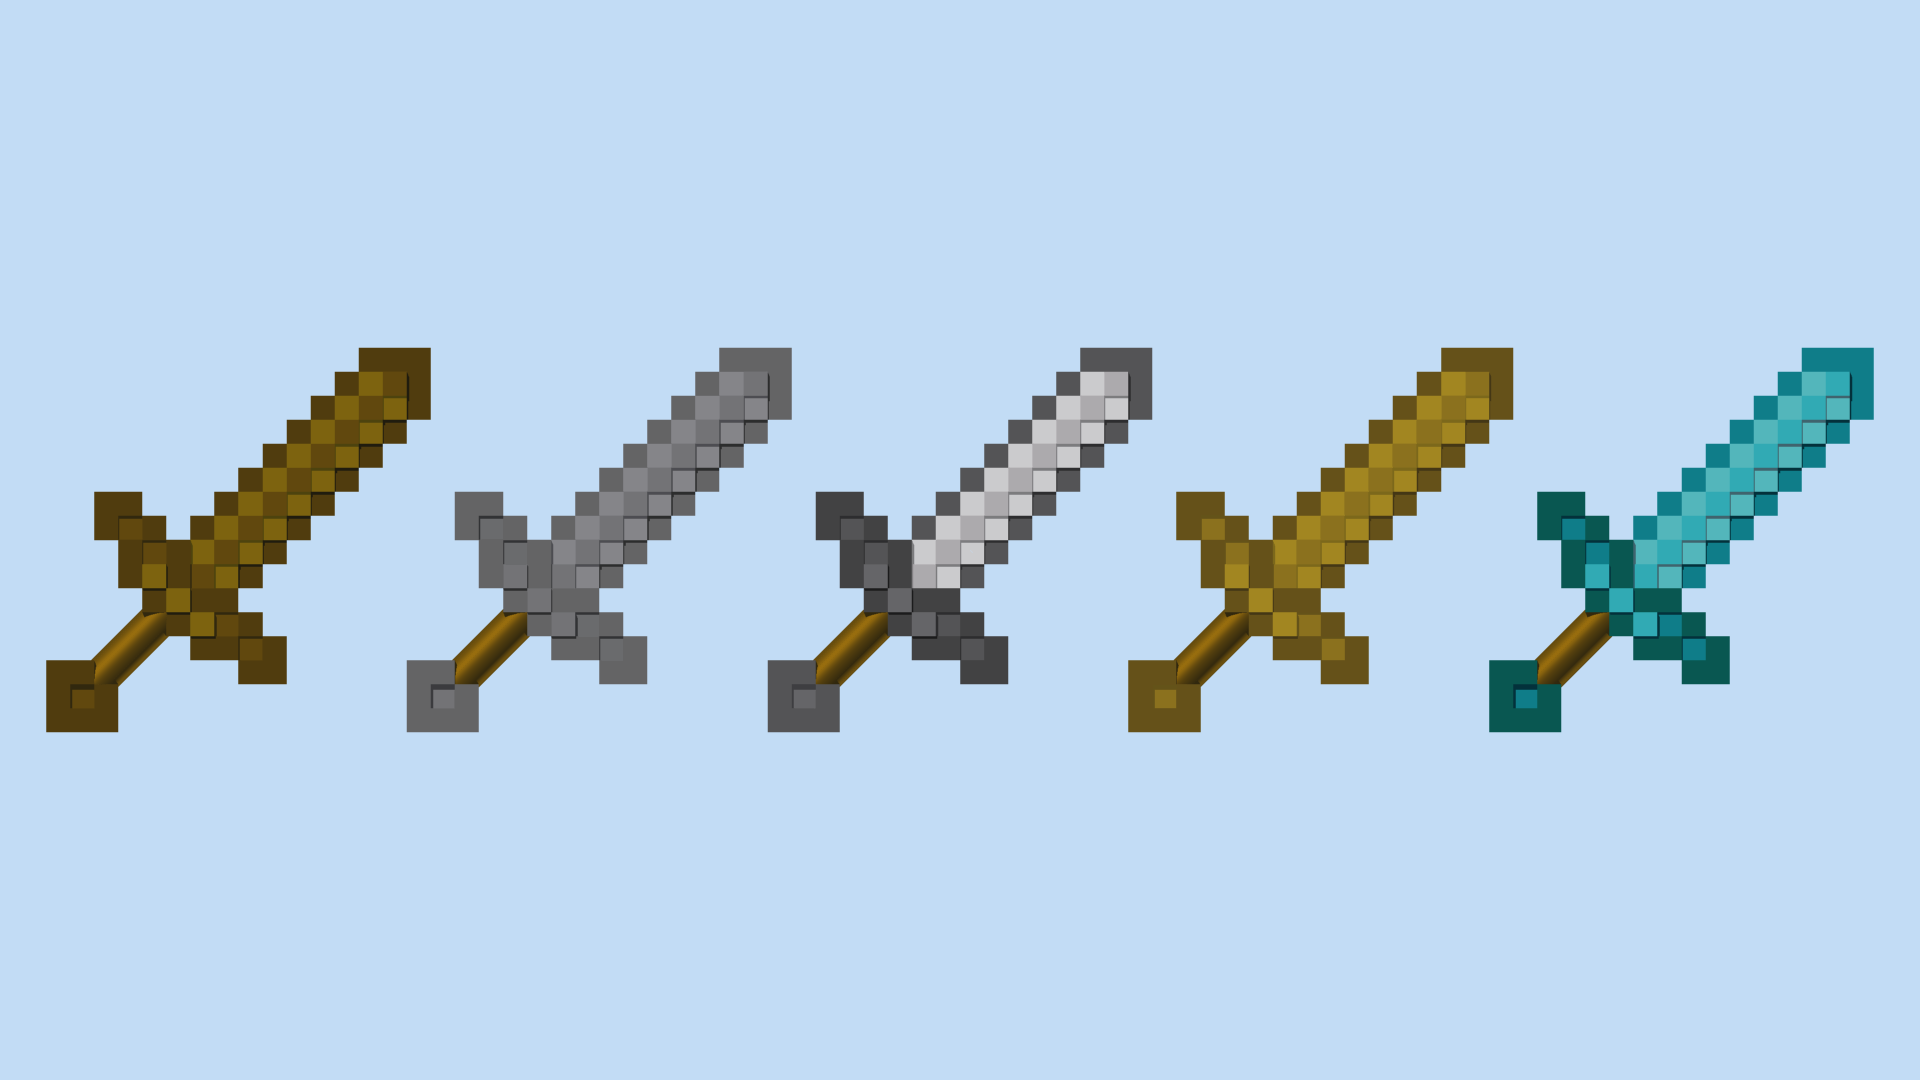 minecraft sword clipart - photo #21